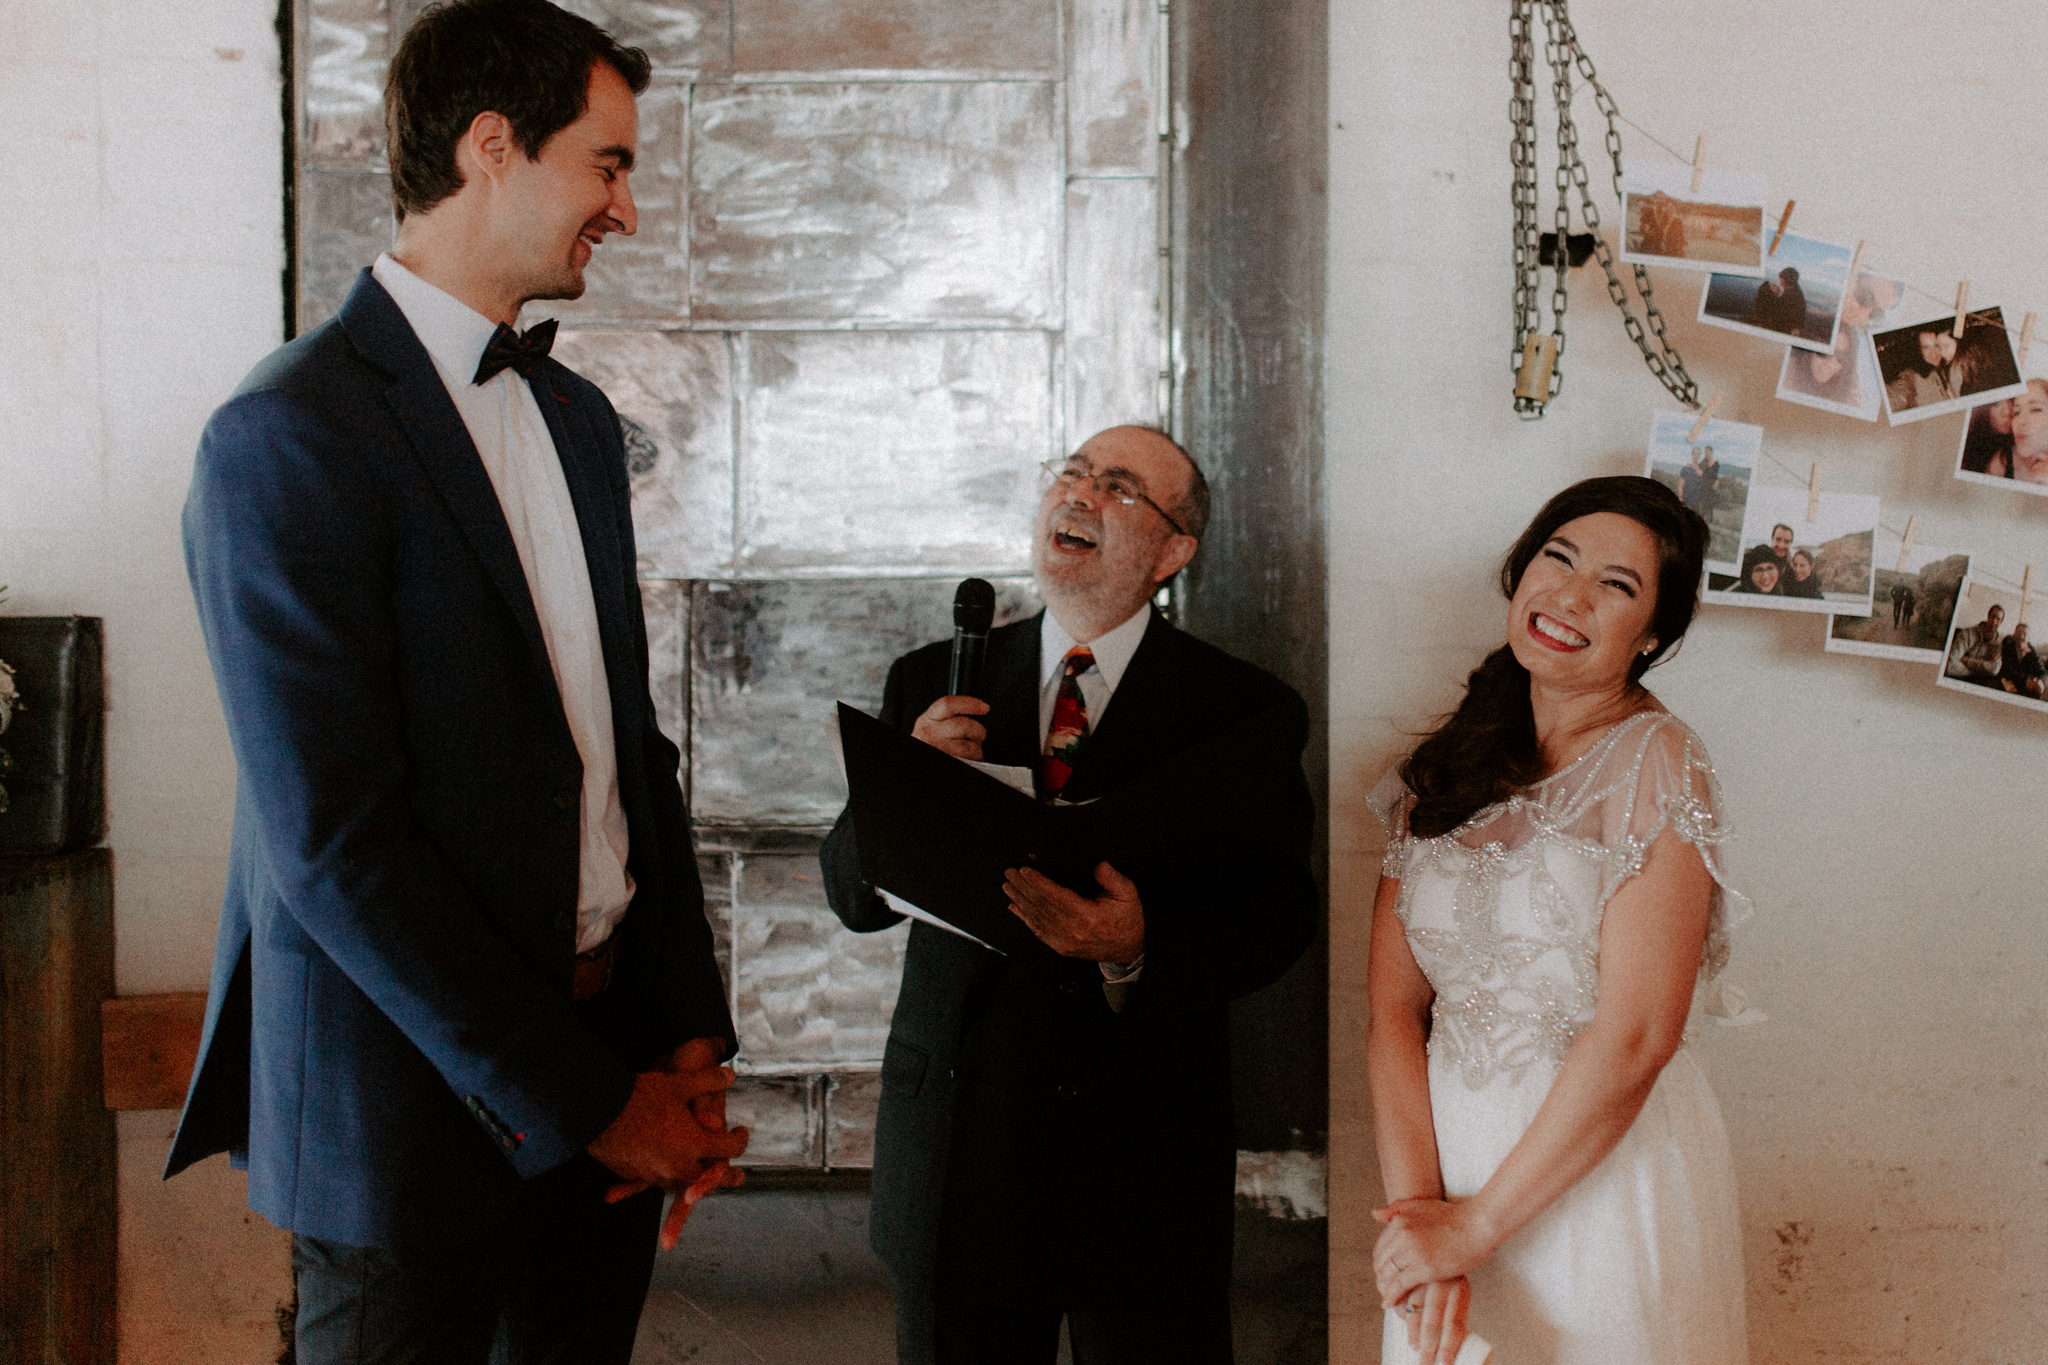 St-Ali-Wedding-Emotions-and-Math-Photography-035.jpg